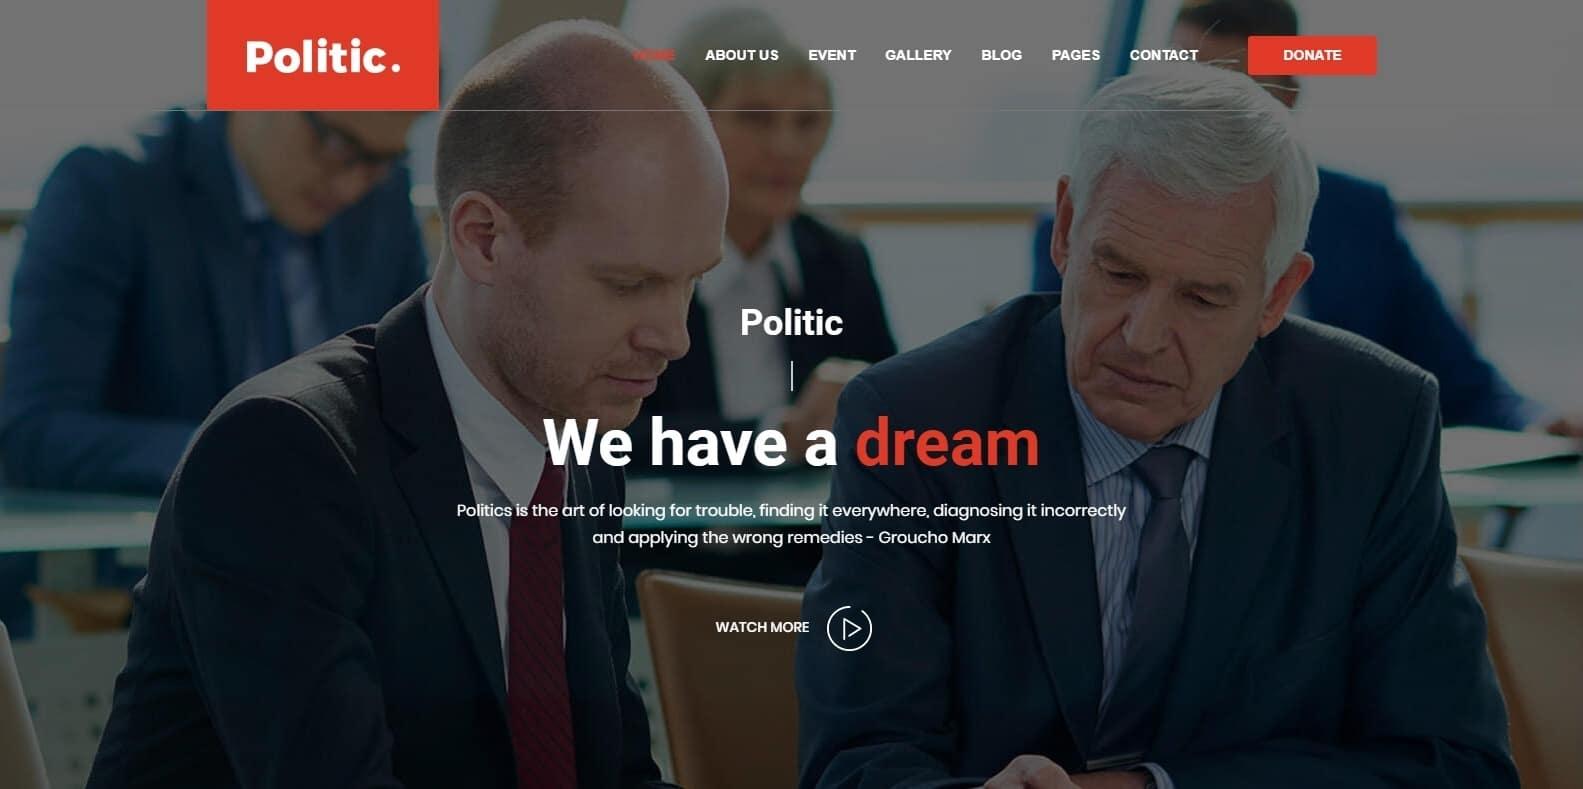 politic-political-website-template